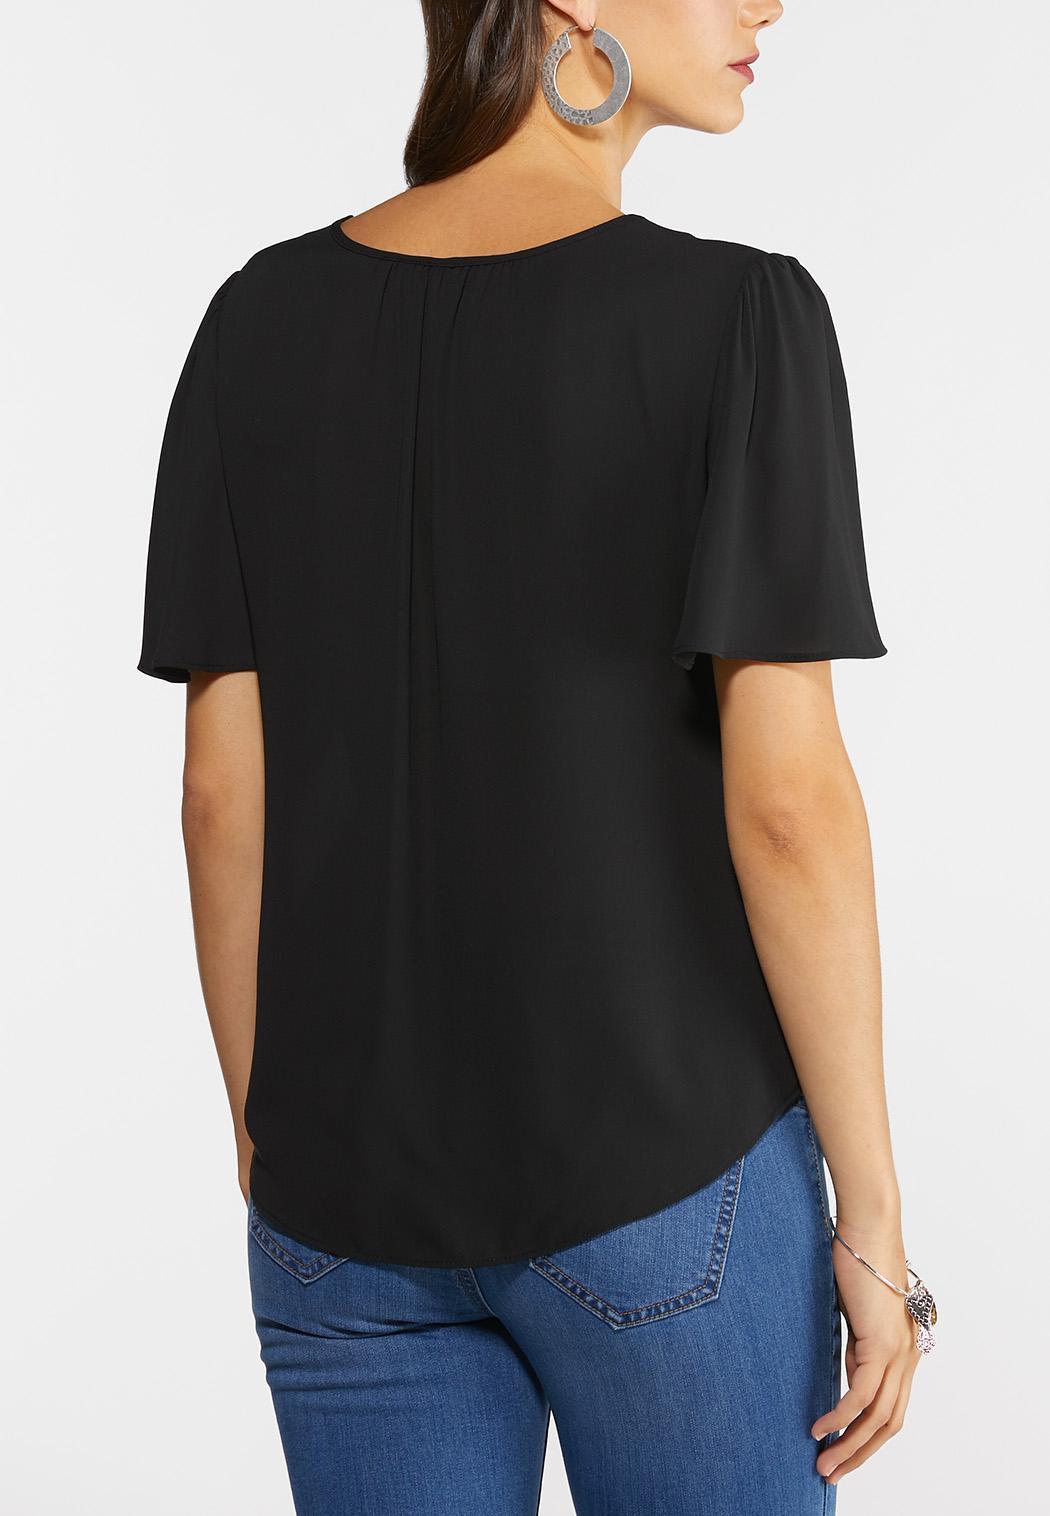 Plus Size Lace Lined Top (Item #44279331)